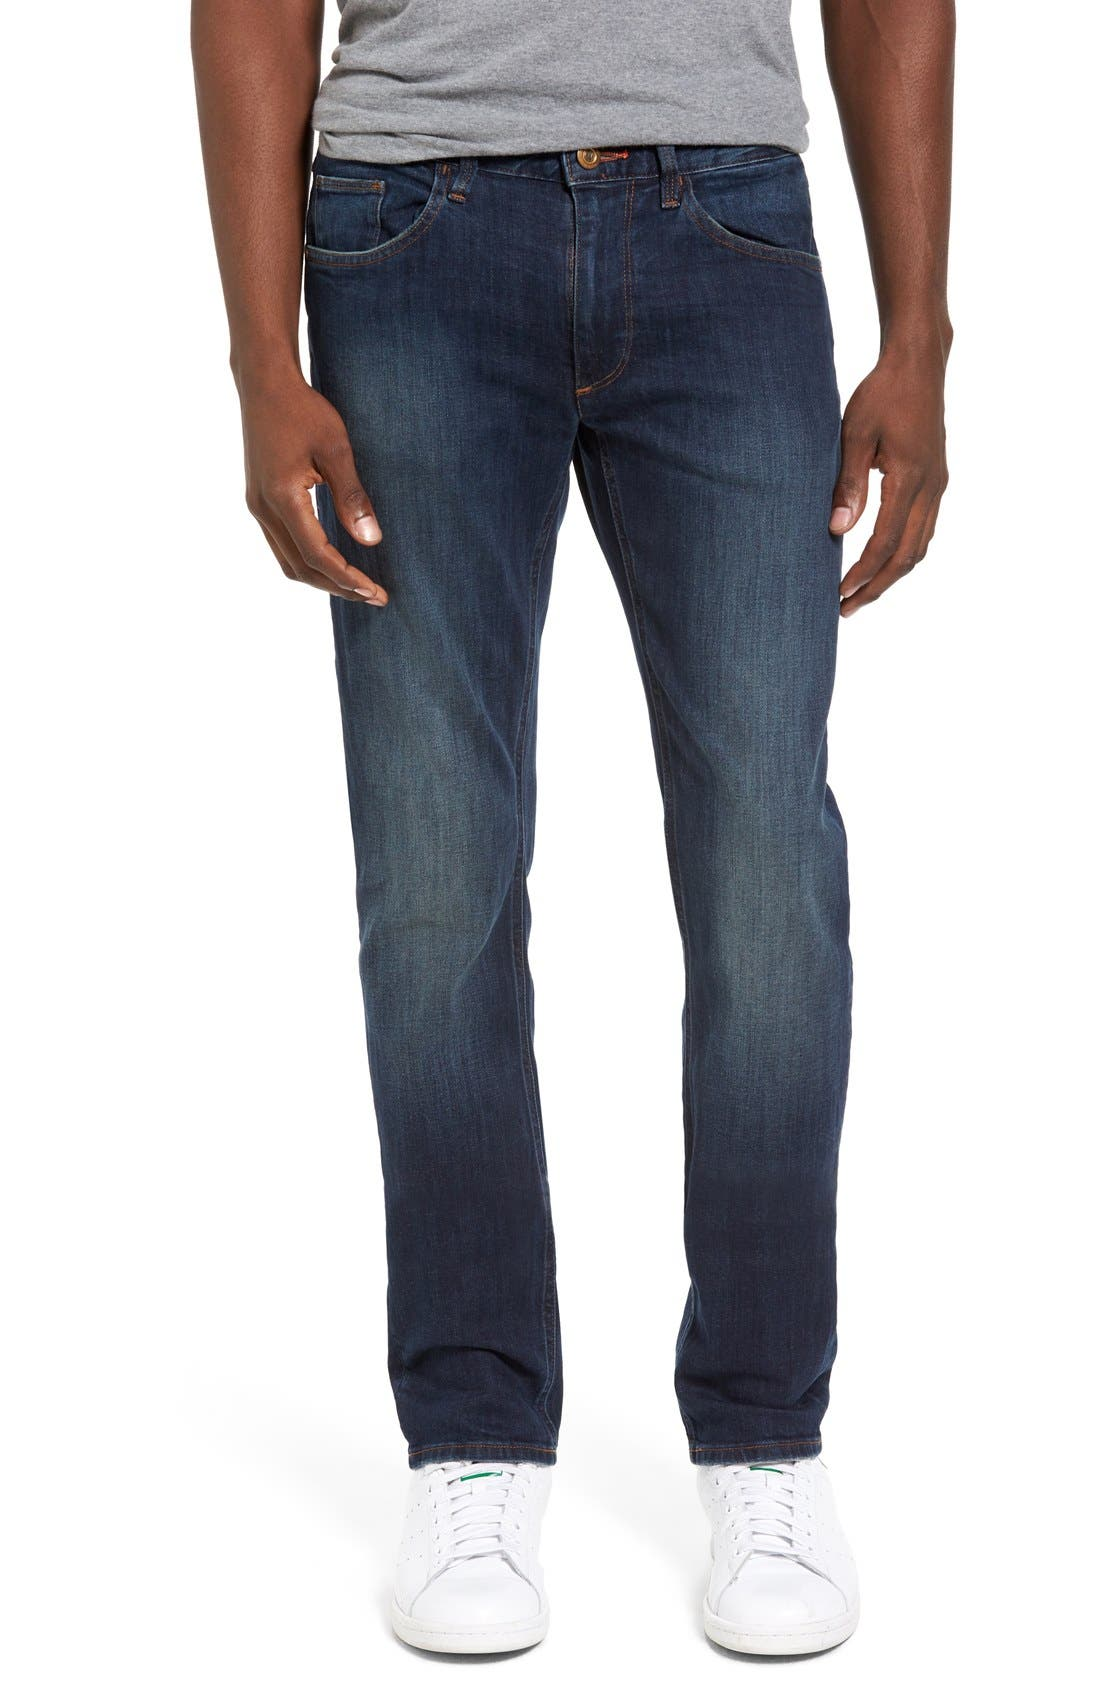 Main Image - Psycho Bunny Spitfire Slim Fit Jeans